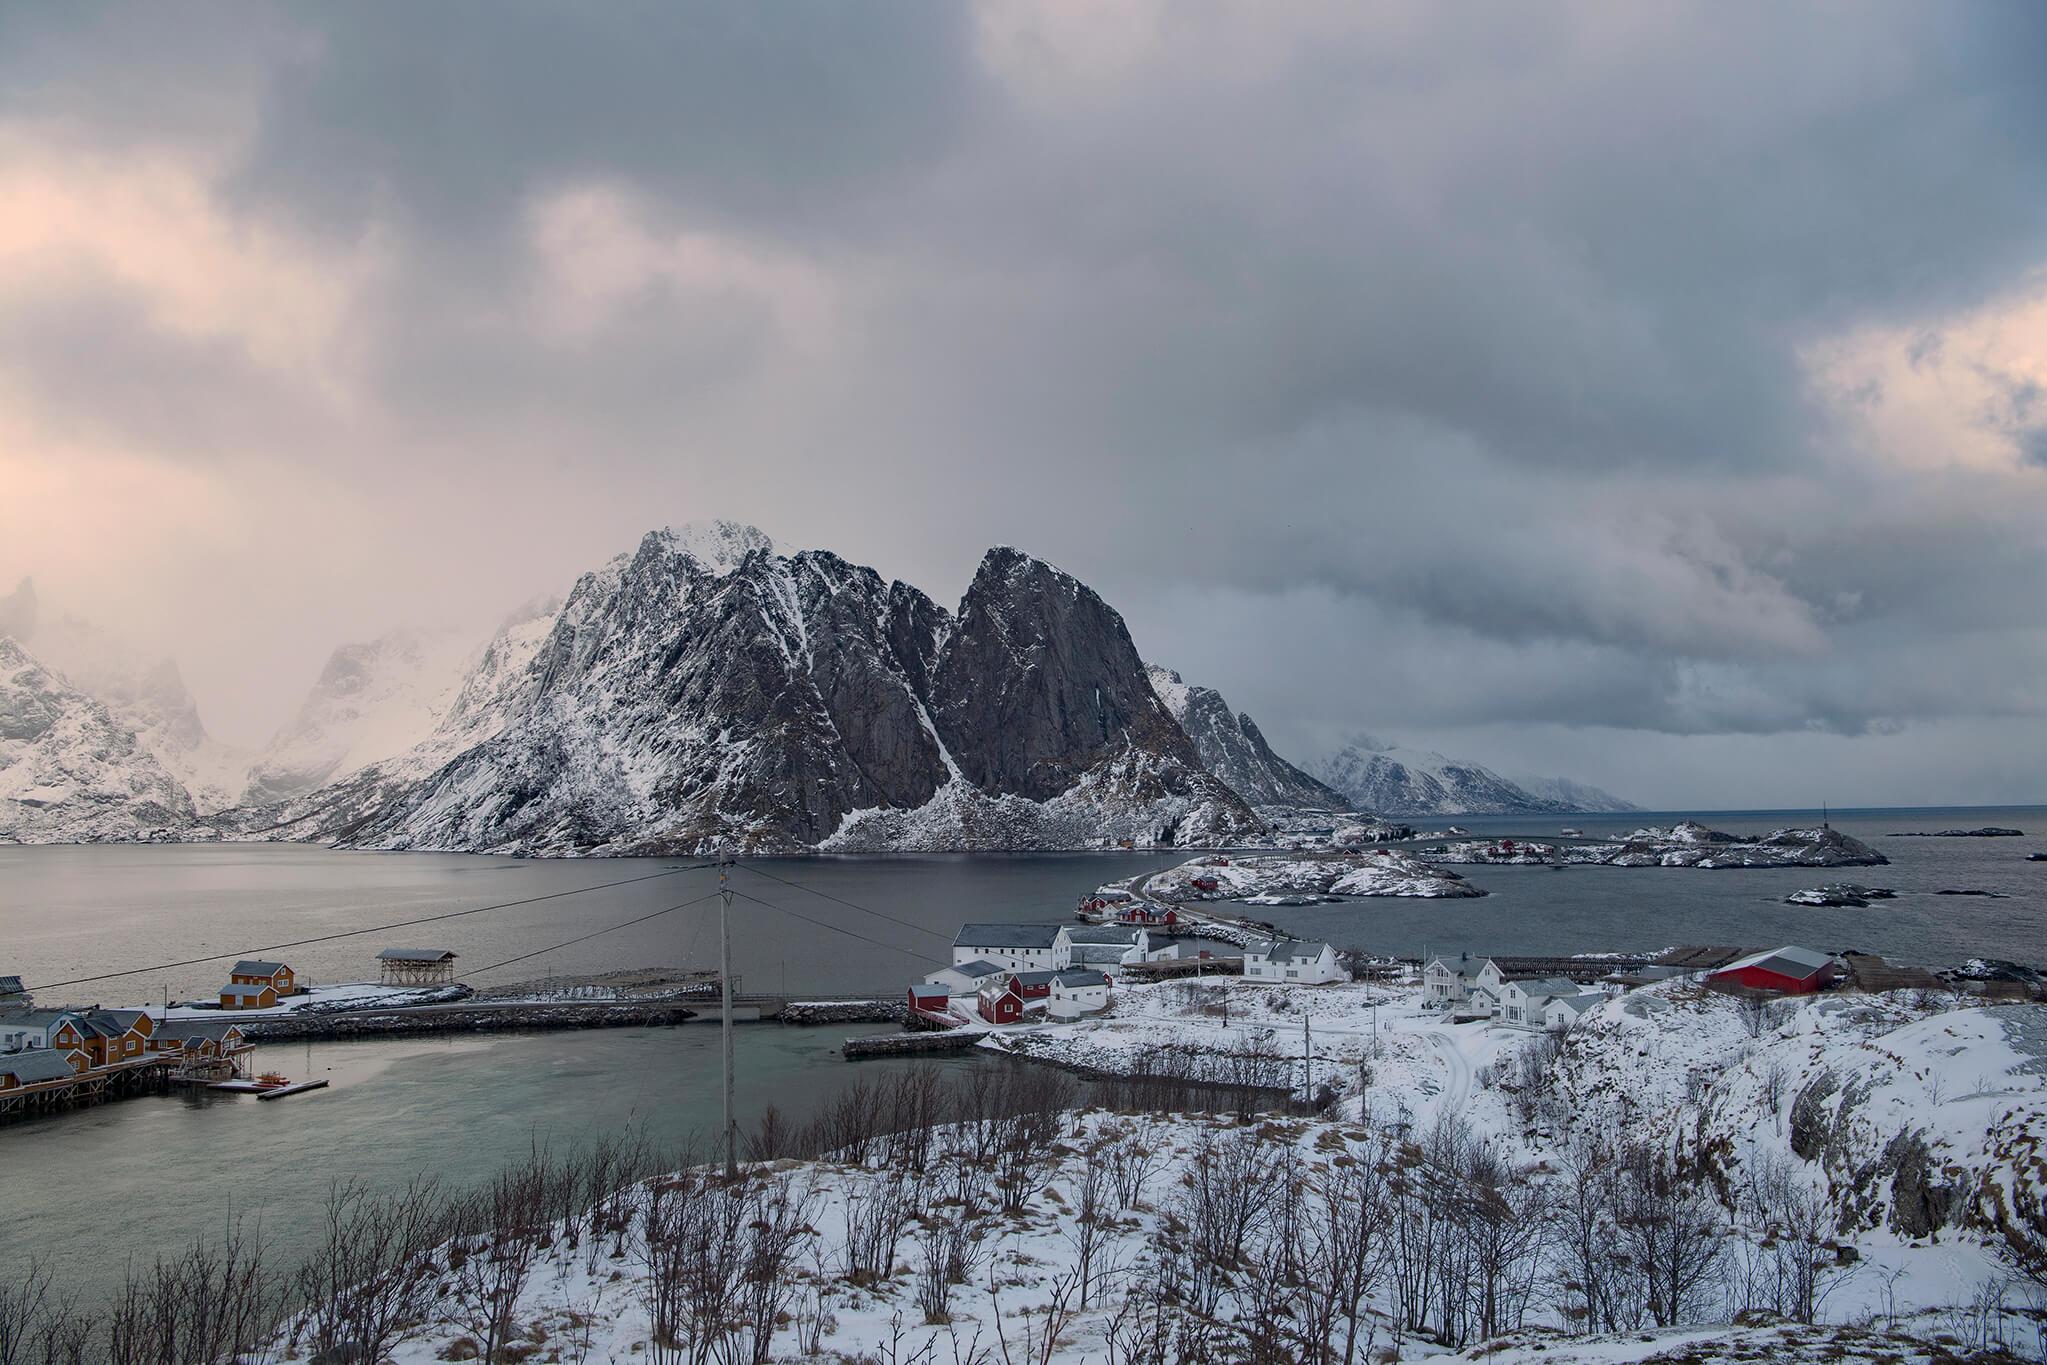 Donfer Photography | 海外婚紗作品 | Tromso | Lofoten Island | Reine | Oversea Pre-Wedding | World Best Wedding Photographer